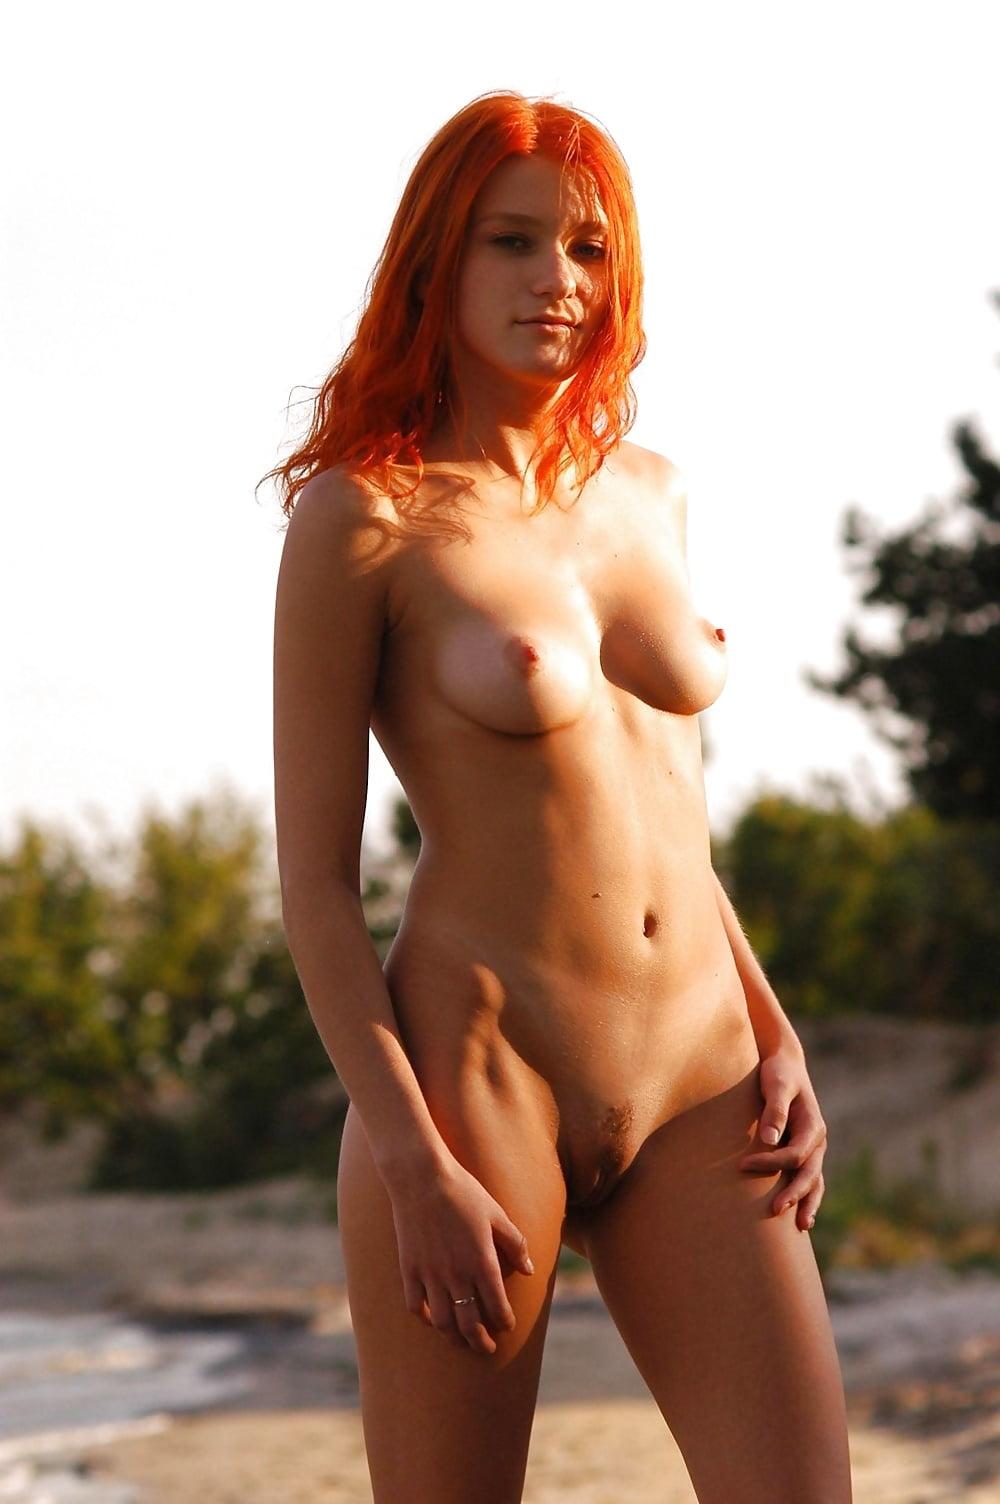 Athletic redhead pics